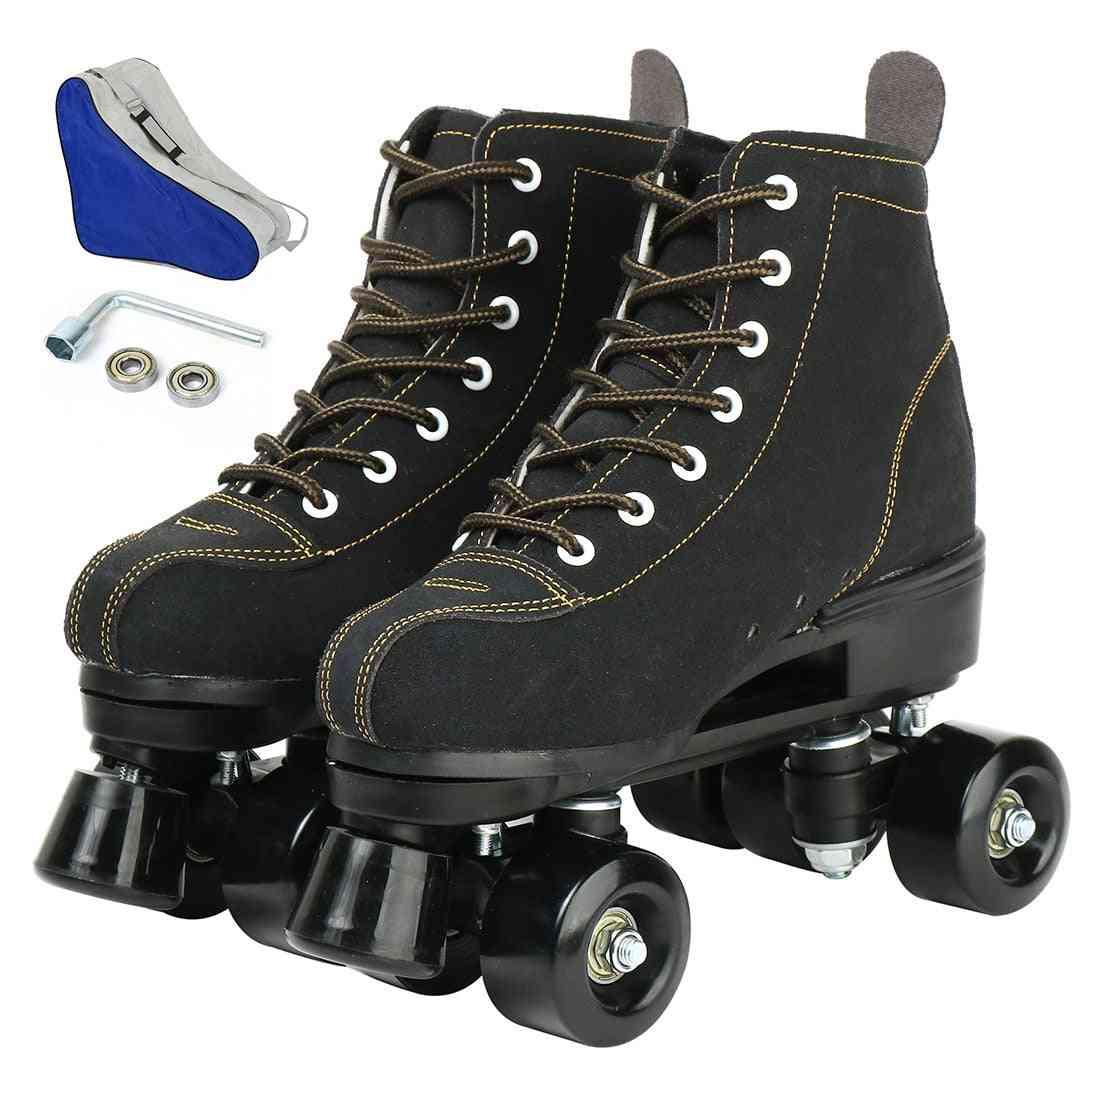 Roller Skates, Flash Wheels Shoes, Double Line Skates